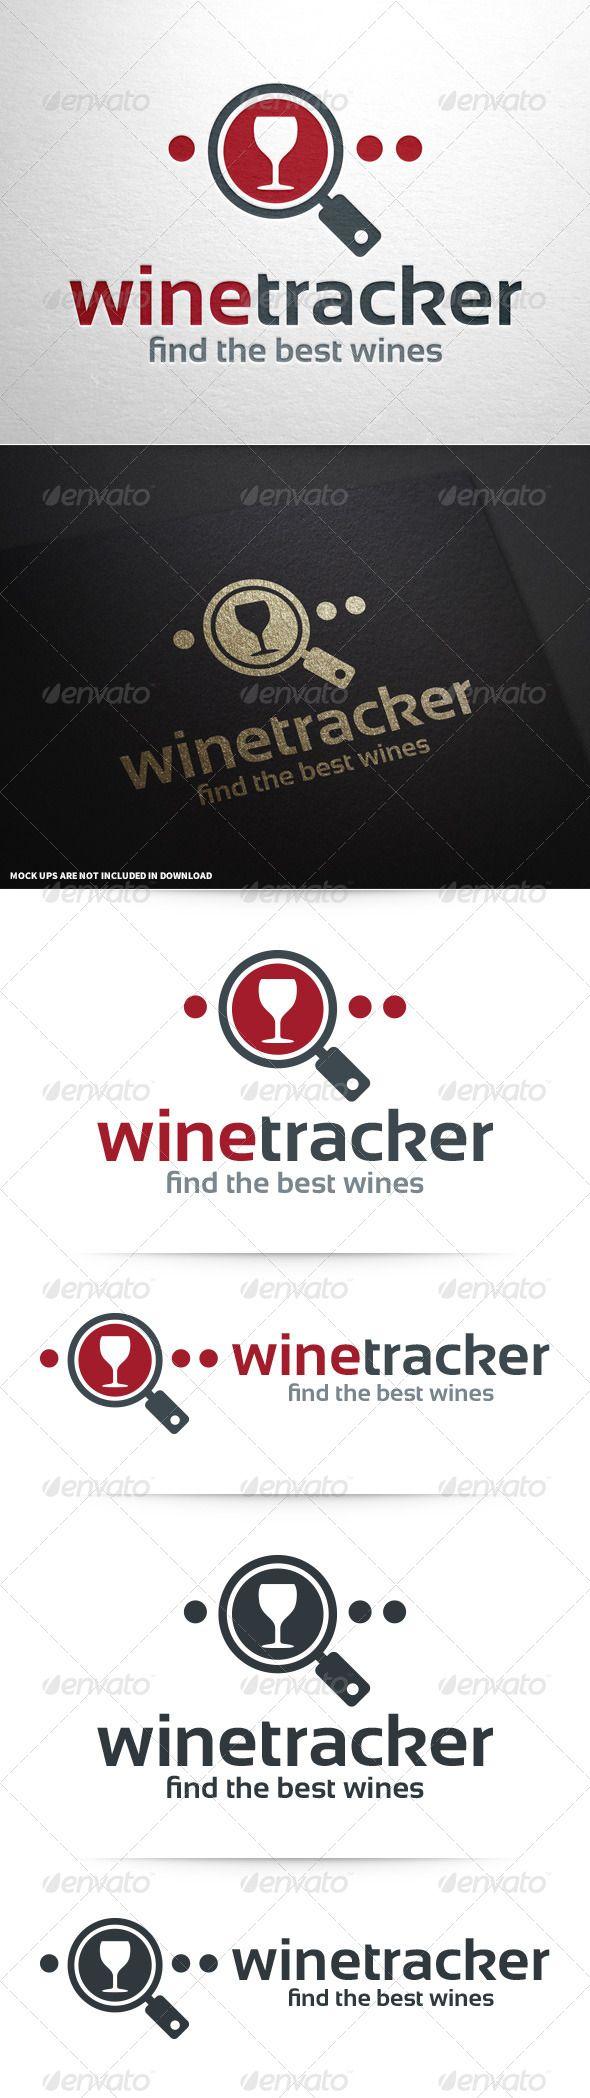 wine tracker logo template pinterest logo templates